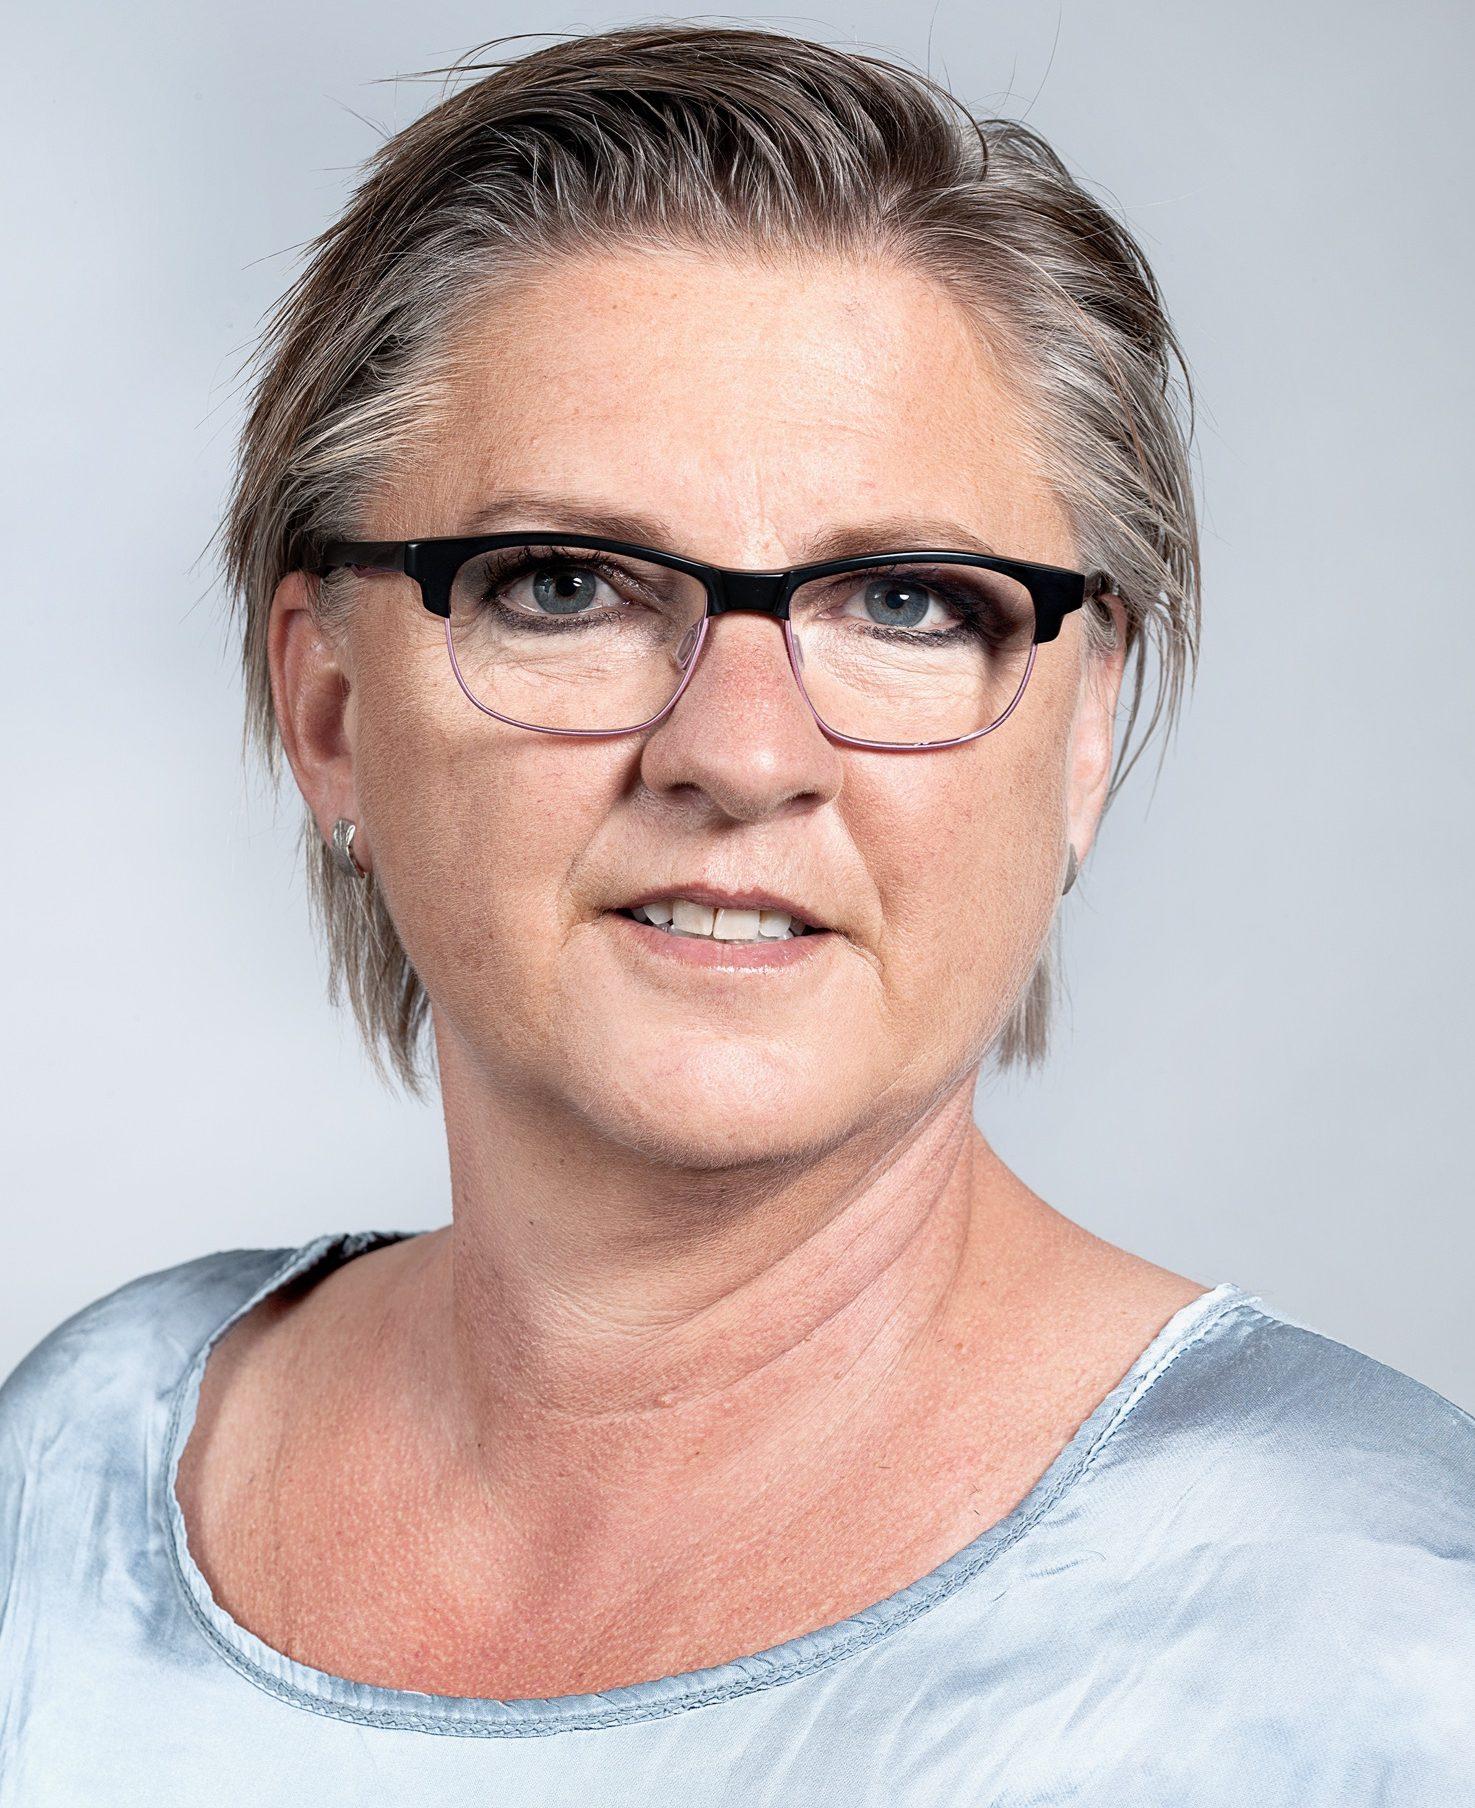 Marianne de Bie